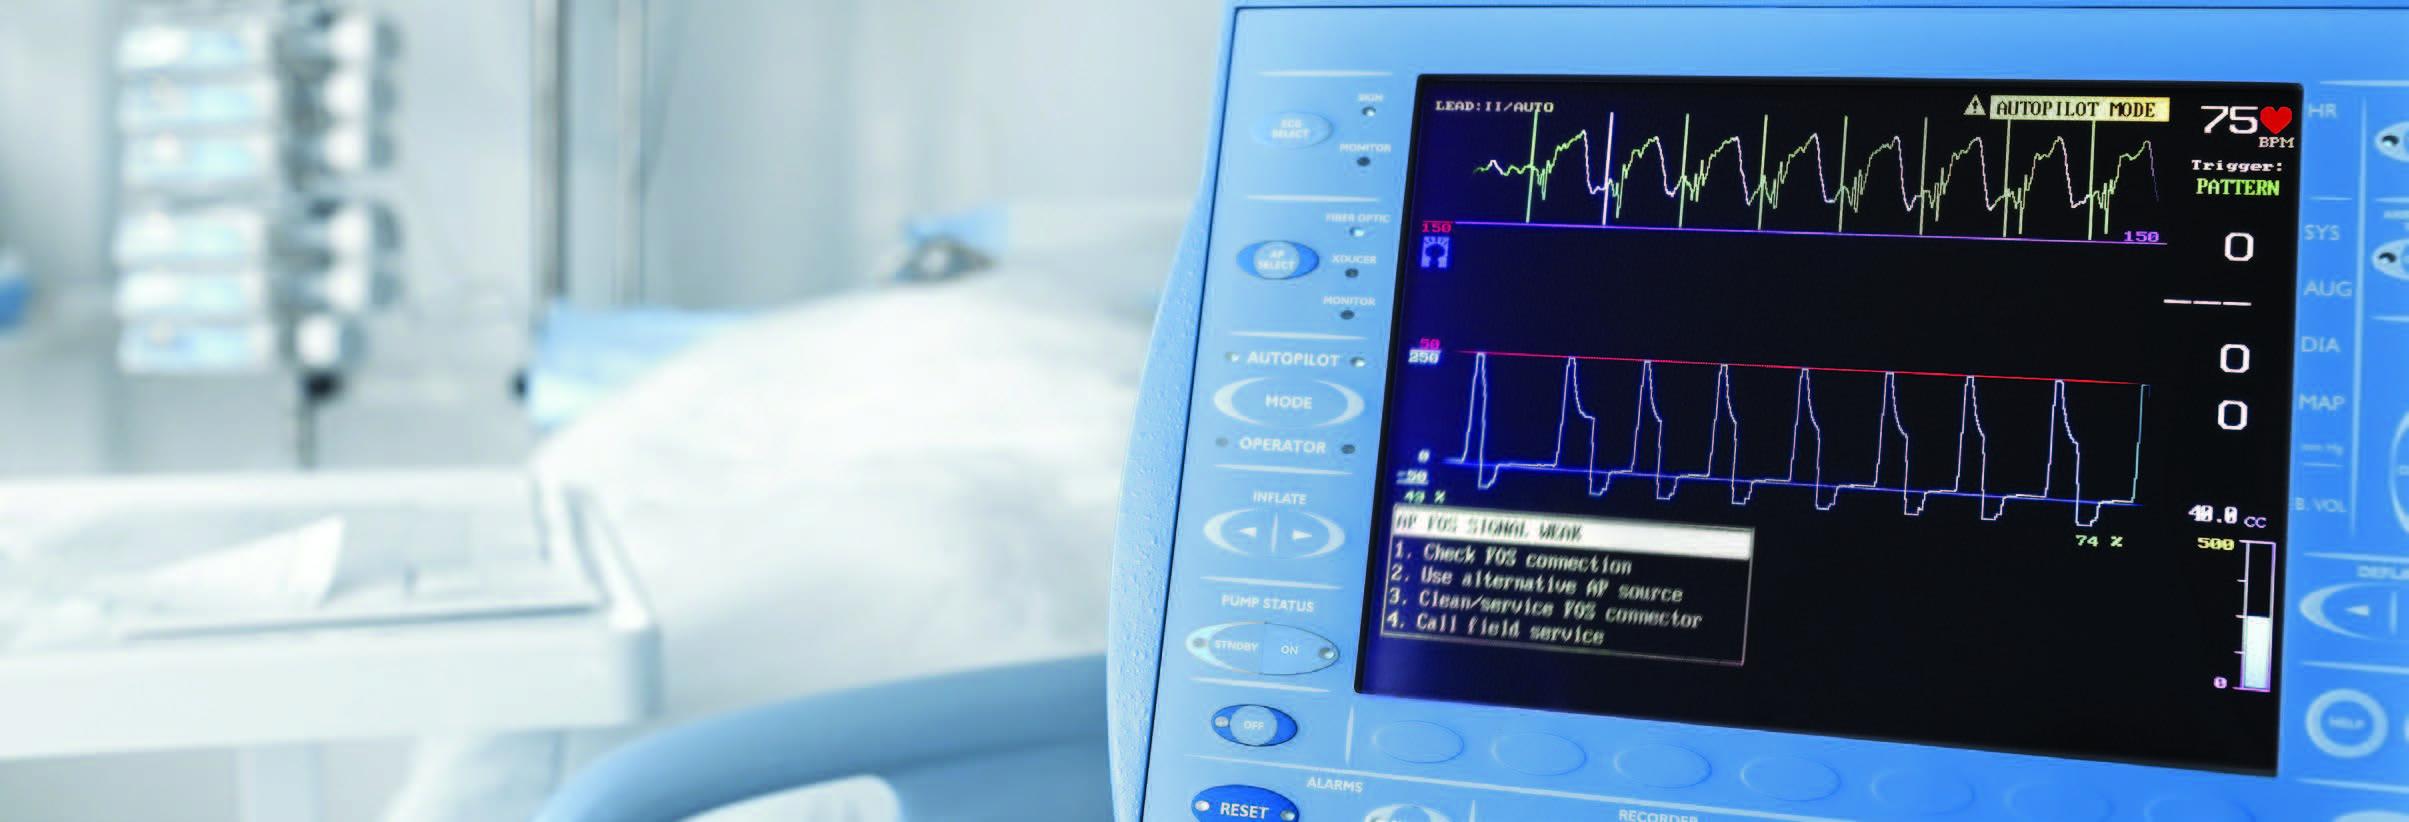 EKG Technician Training Course Image